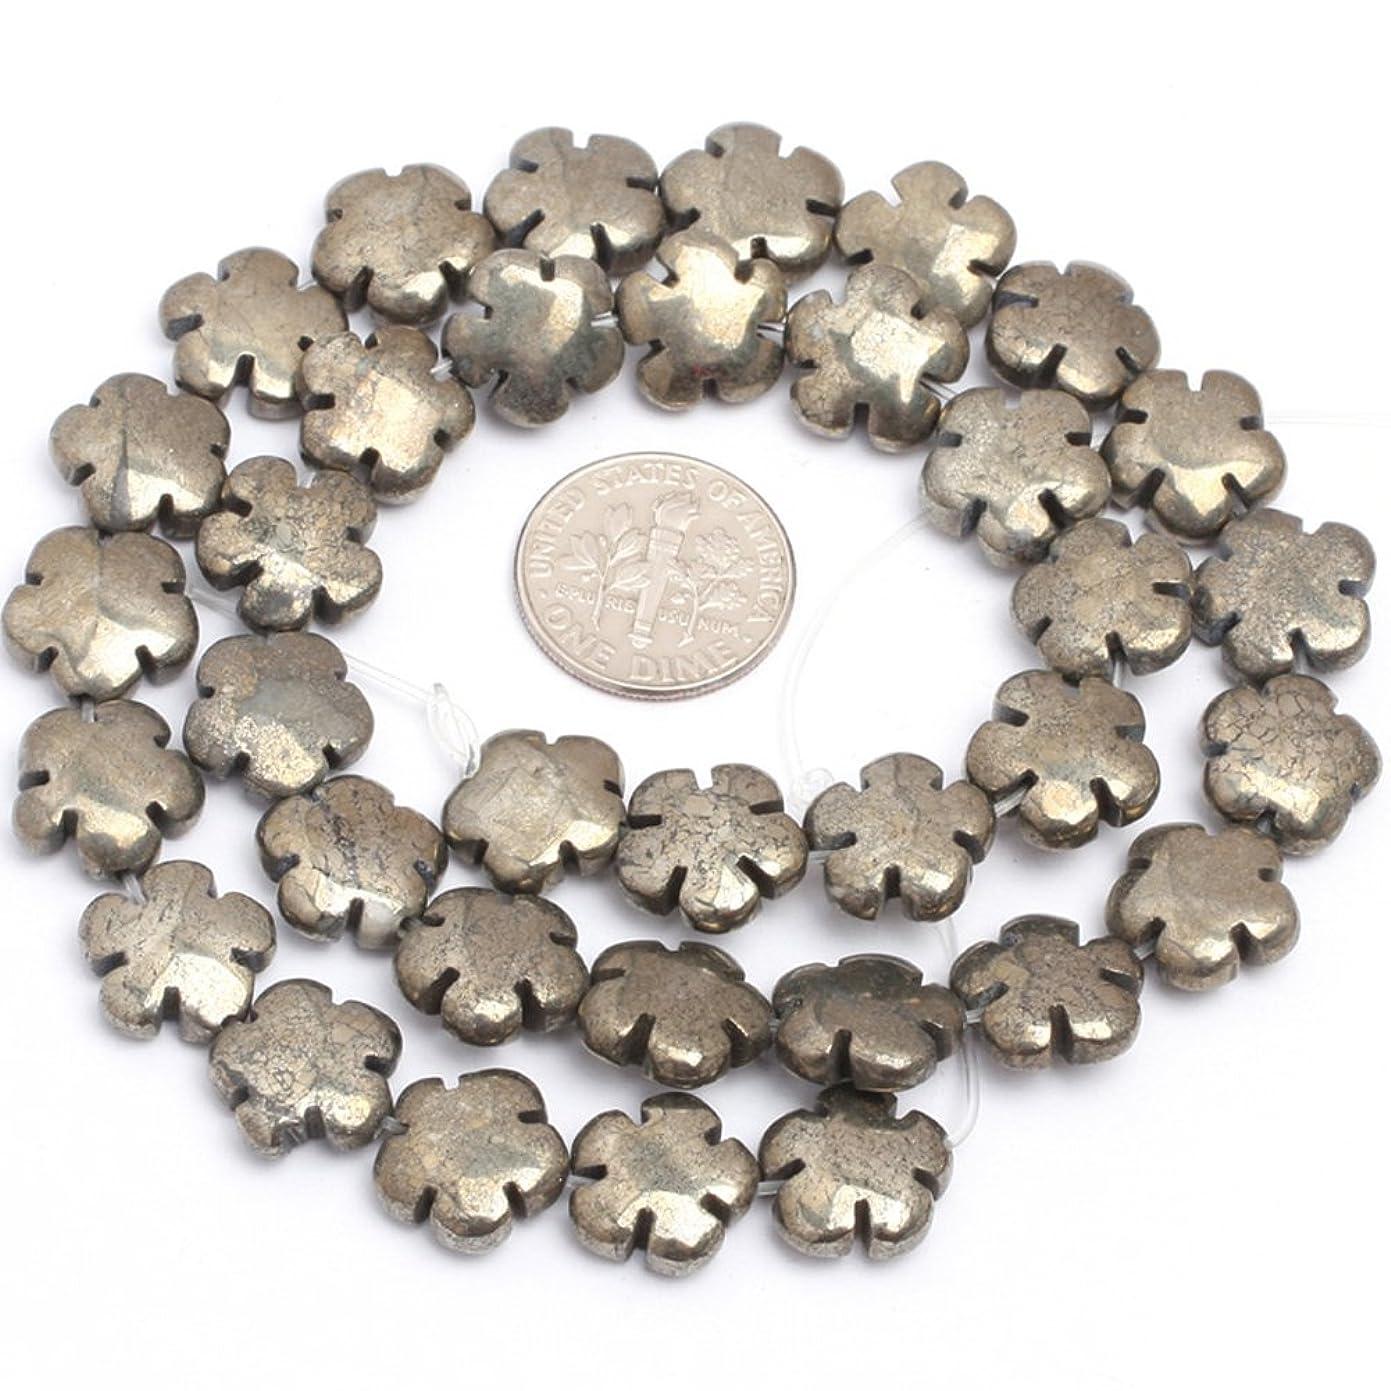 JOE FOREMAN 12mm Pyrite Semi Precious Gemstone Flower Loose Beads for Jewelry Making DIY Handmade Craft Supplies 15 qx58456753